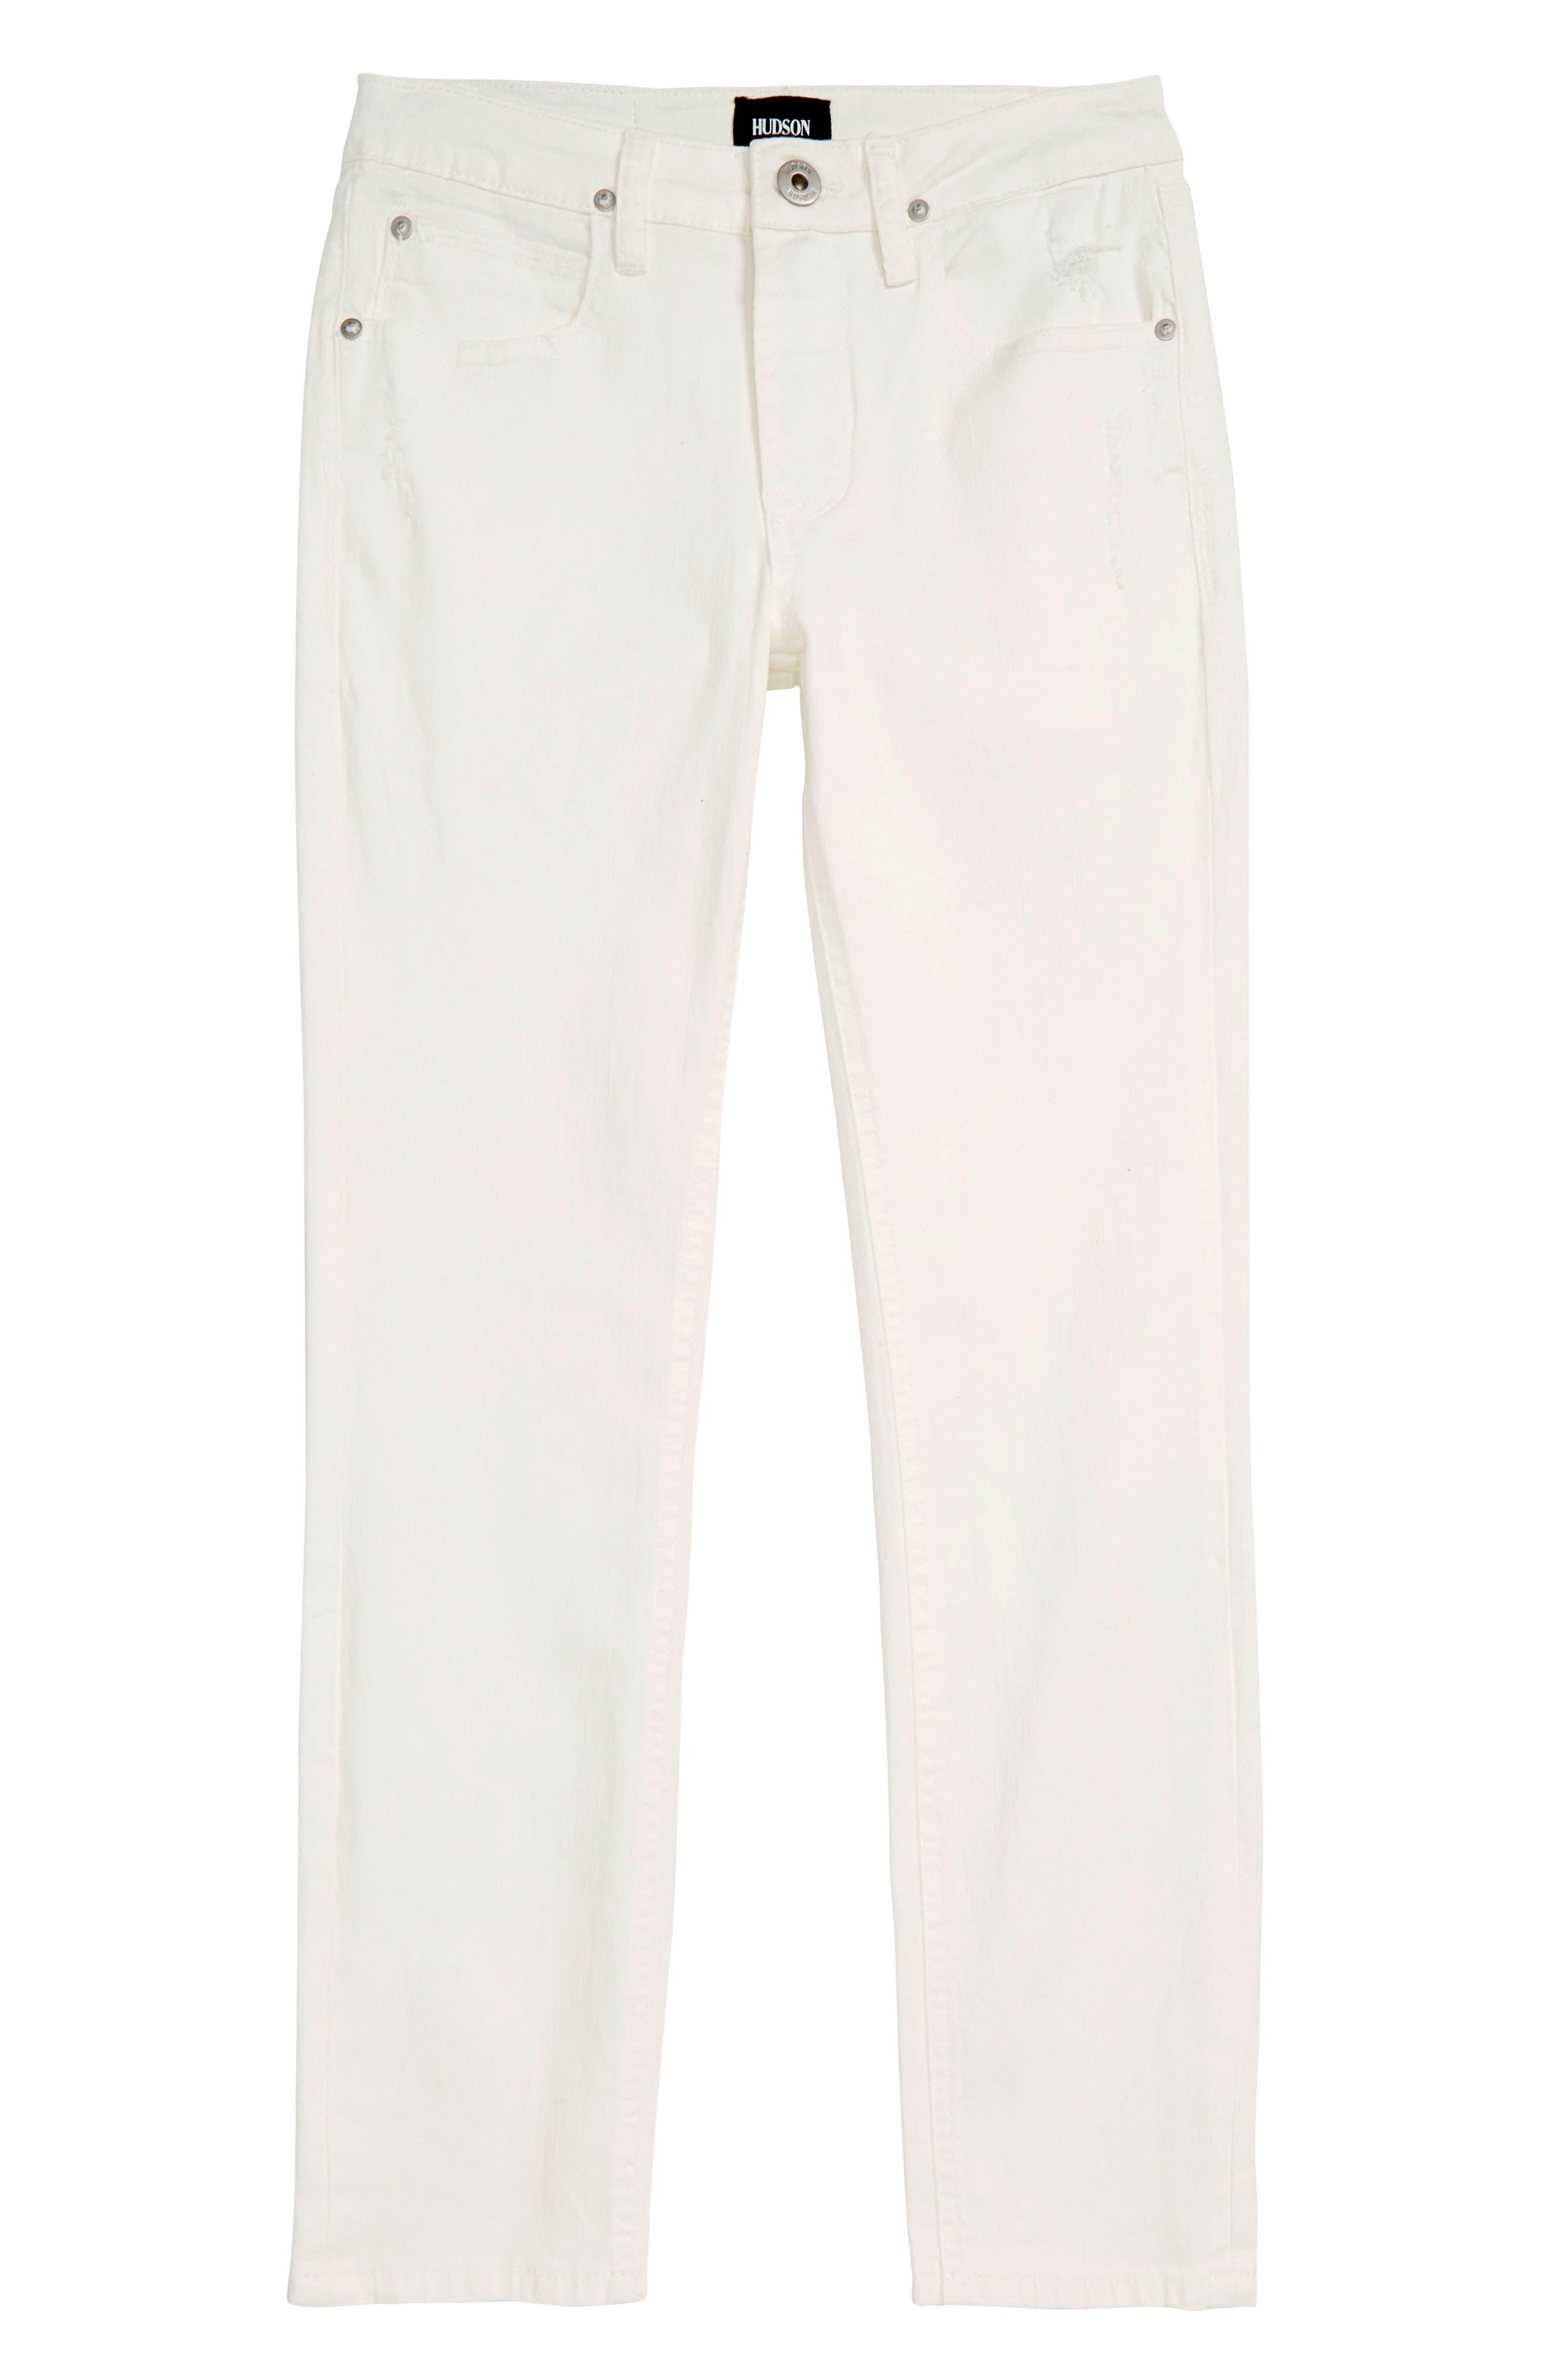 HUDSON KIDS Straight Leg Jeans, Main, color, MOONSHINE